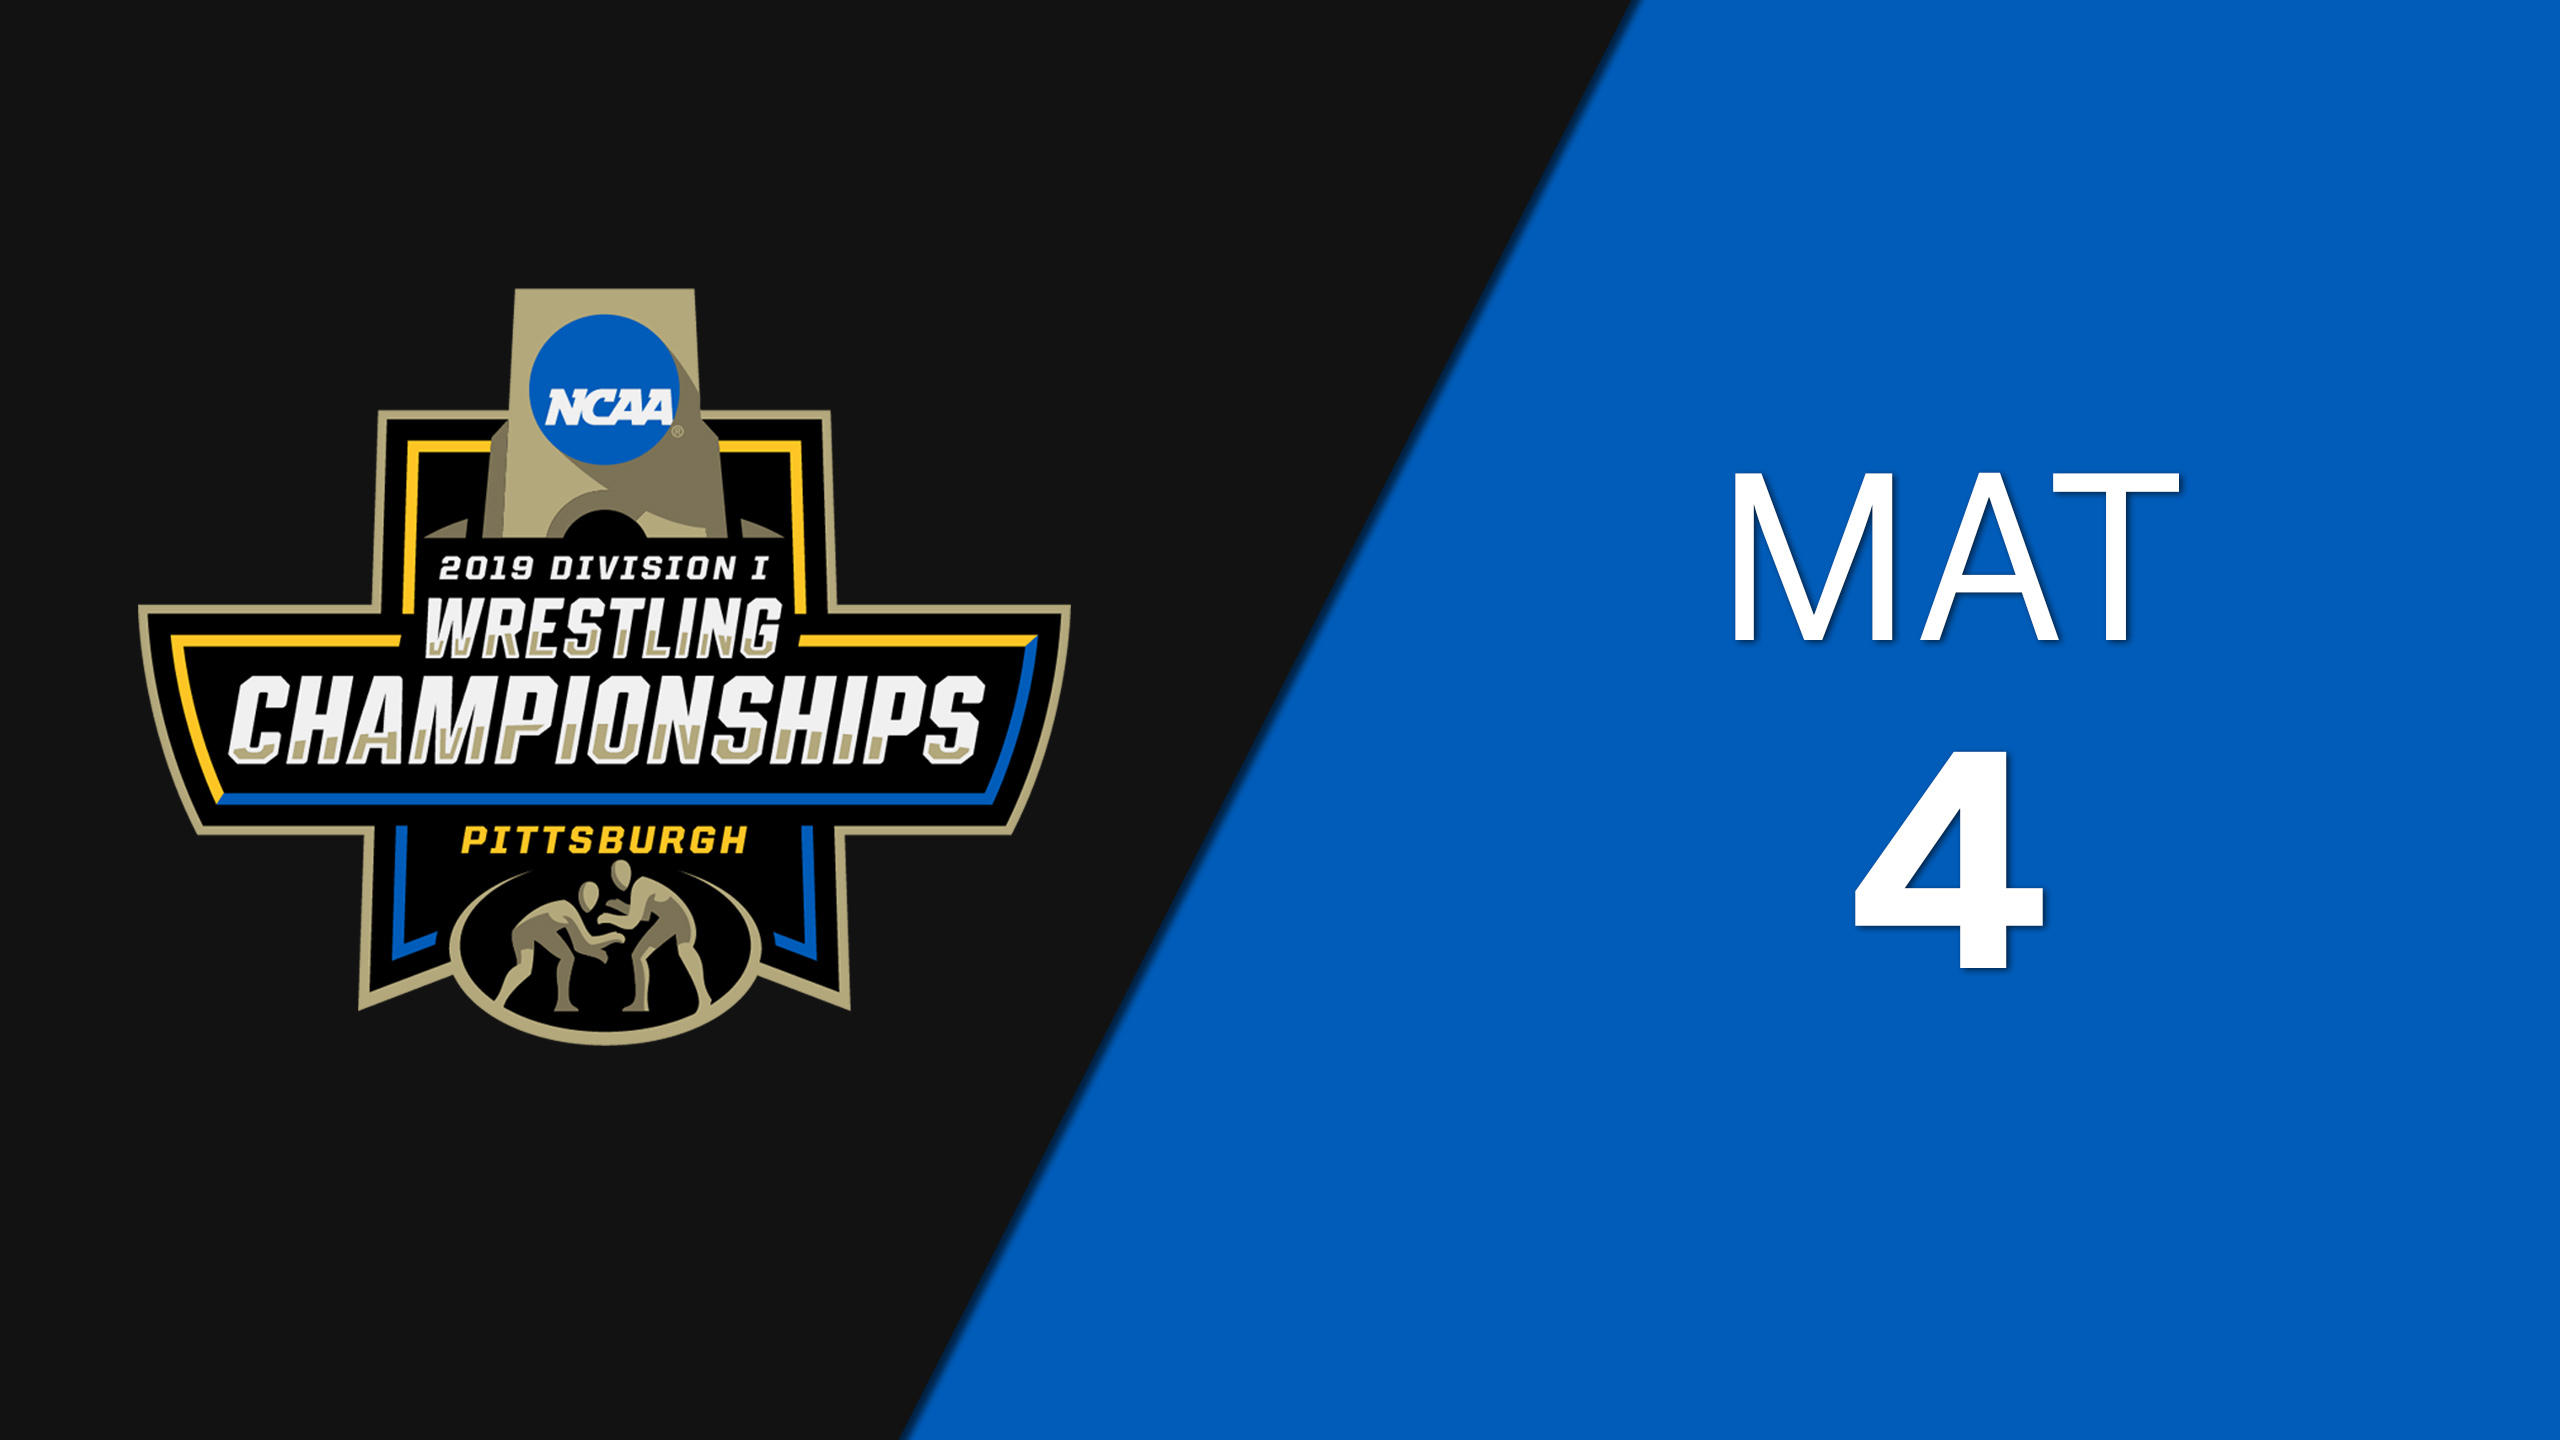 NCAA Wrestling Championship (Mat 4, Semifinals)